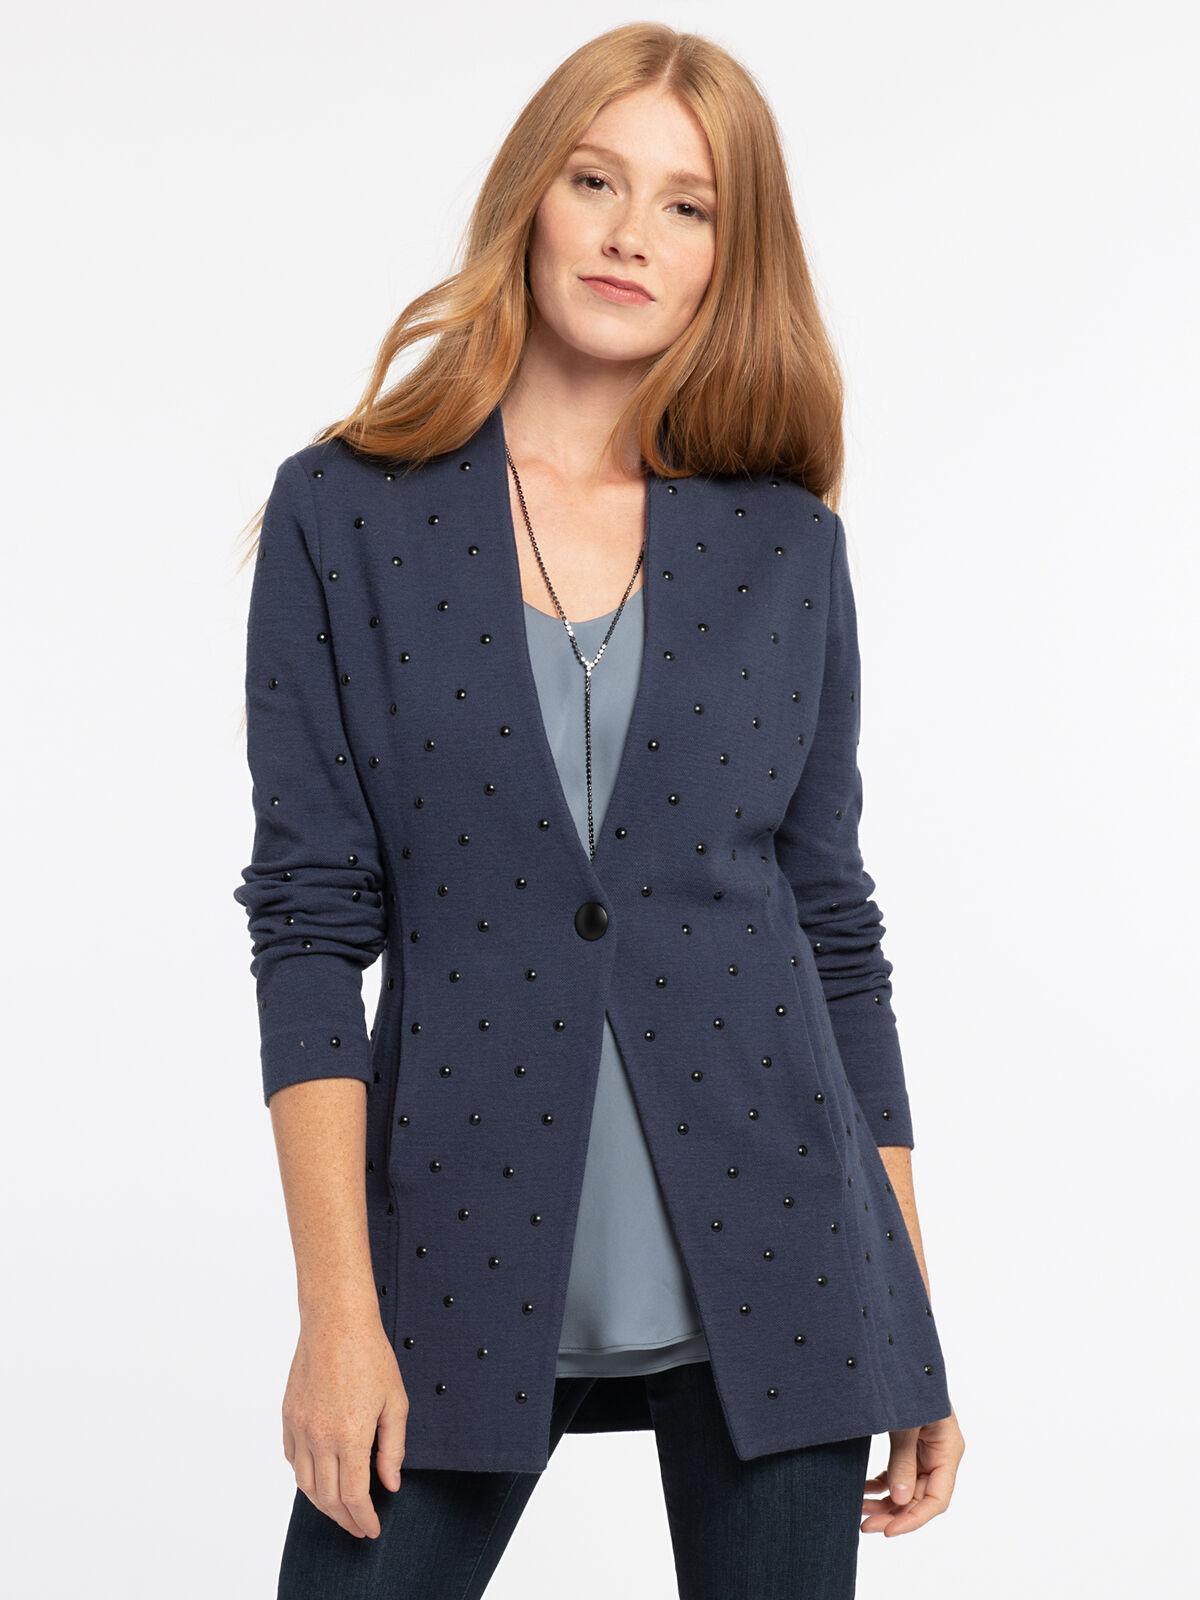 Simply Studded Jacket